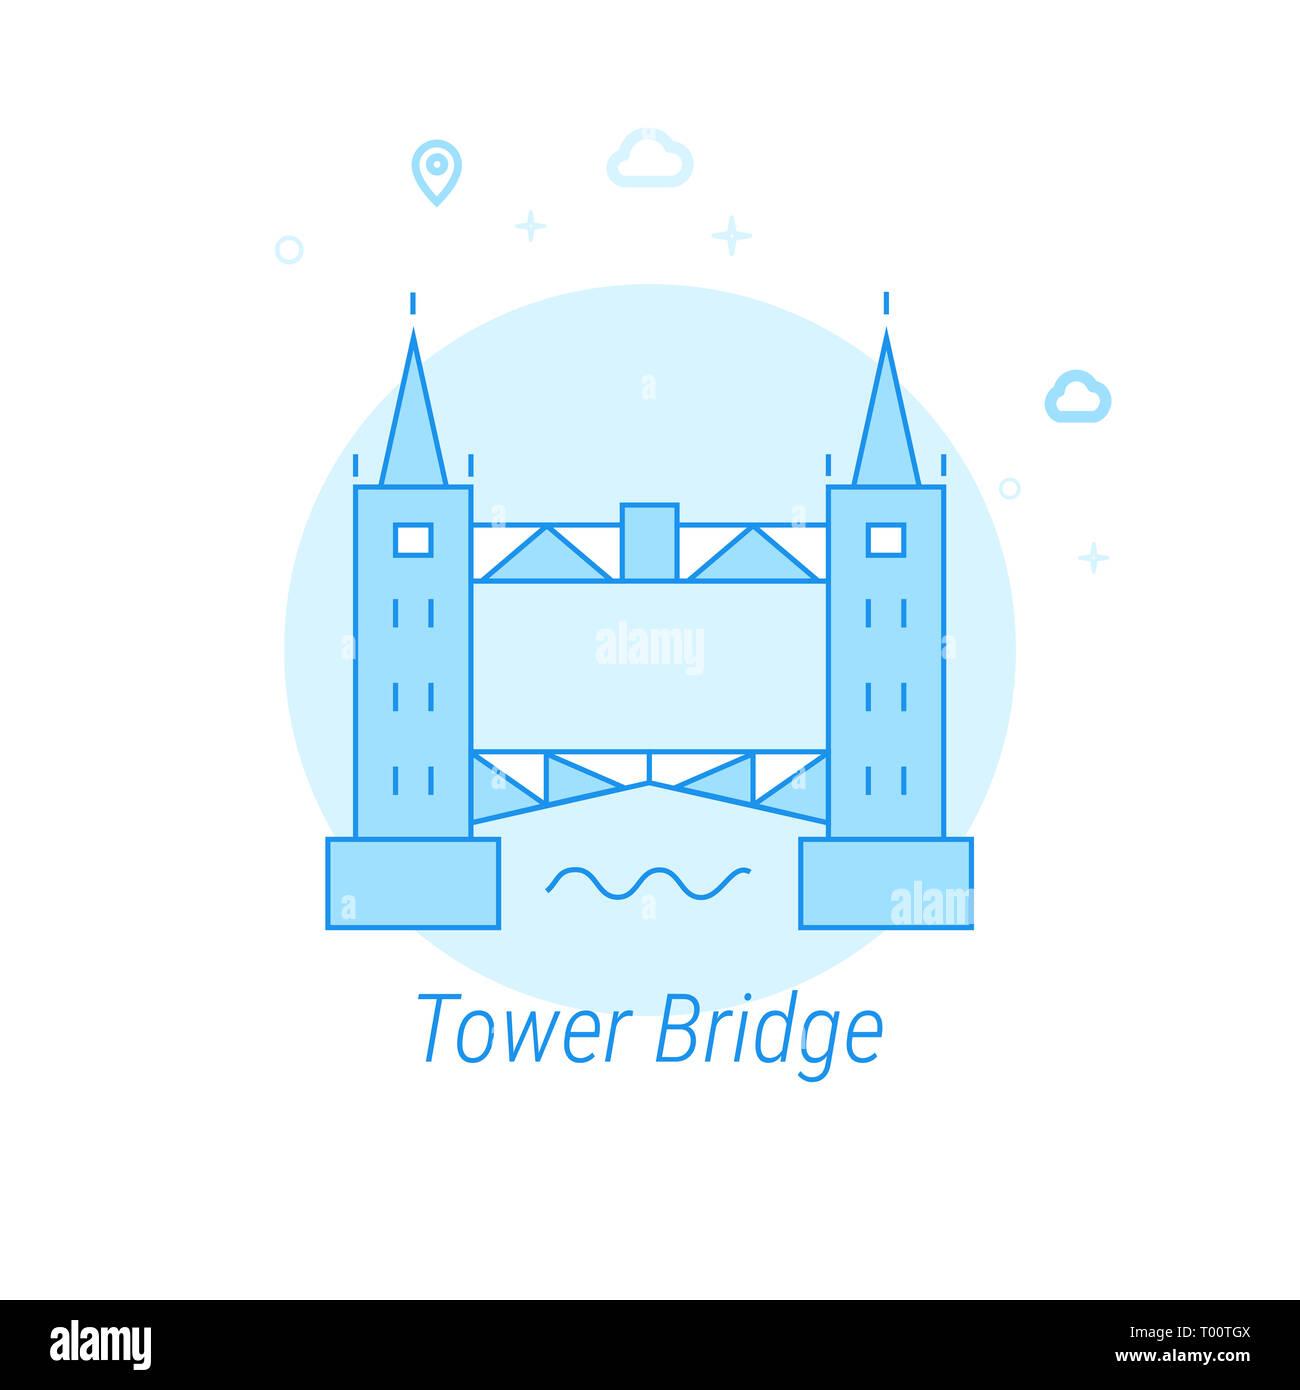 Tower Bridge, London Flat Icon. Historical Landmarks Related Illustration. Light Flat Style. Blue Monochrome Design. Editable Stroke. Adjust Line Weig - Stock Image